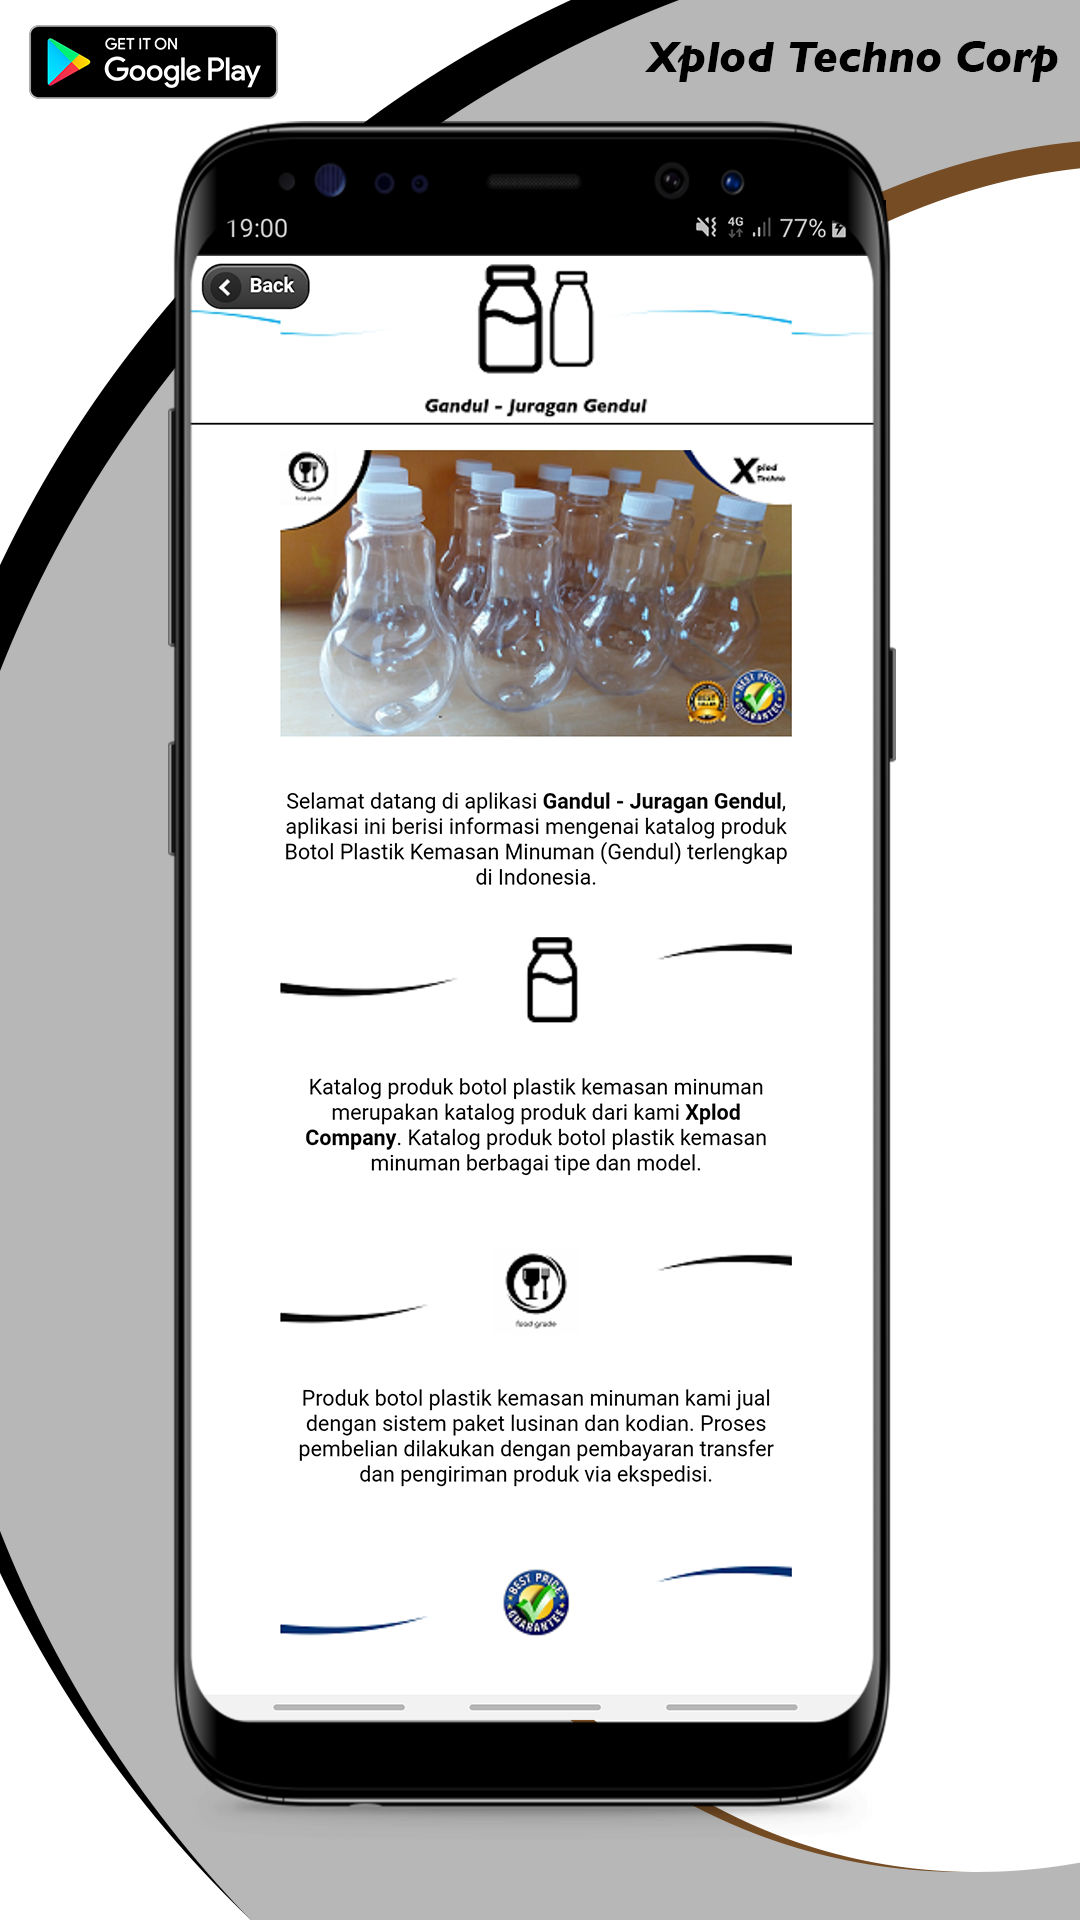 Aplikasi Smartphone Katalog Produk Botol Plastik Kemasan Minuman Dari Solo Smartphone Kemasan Minuman Aplikasi